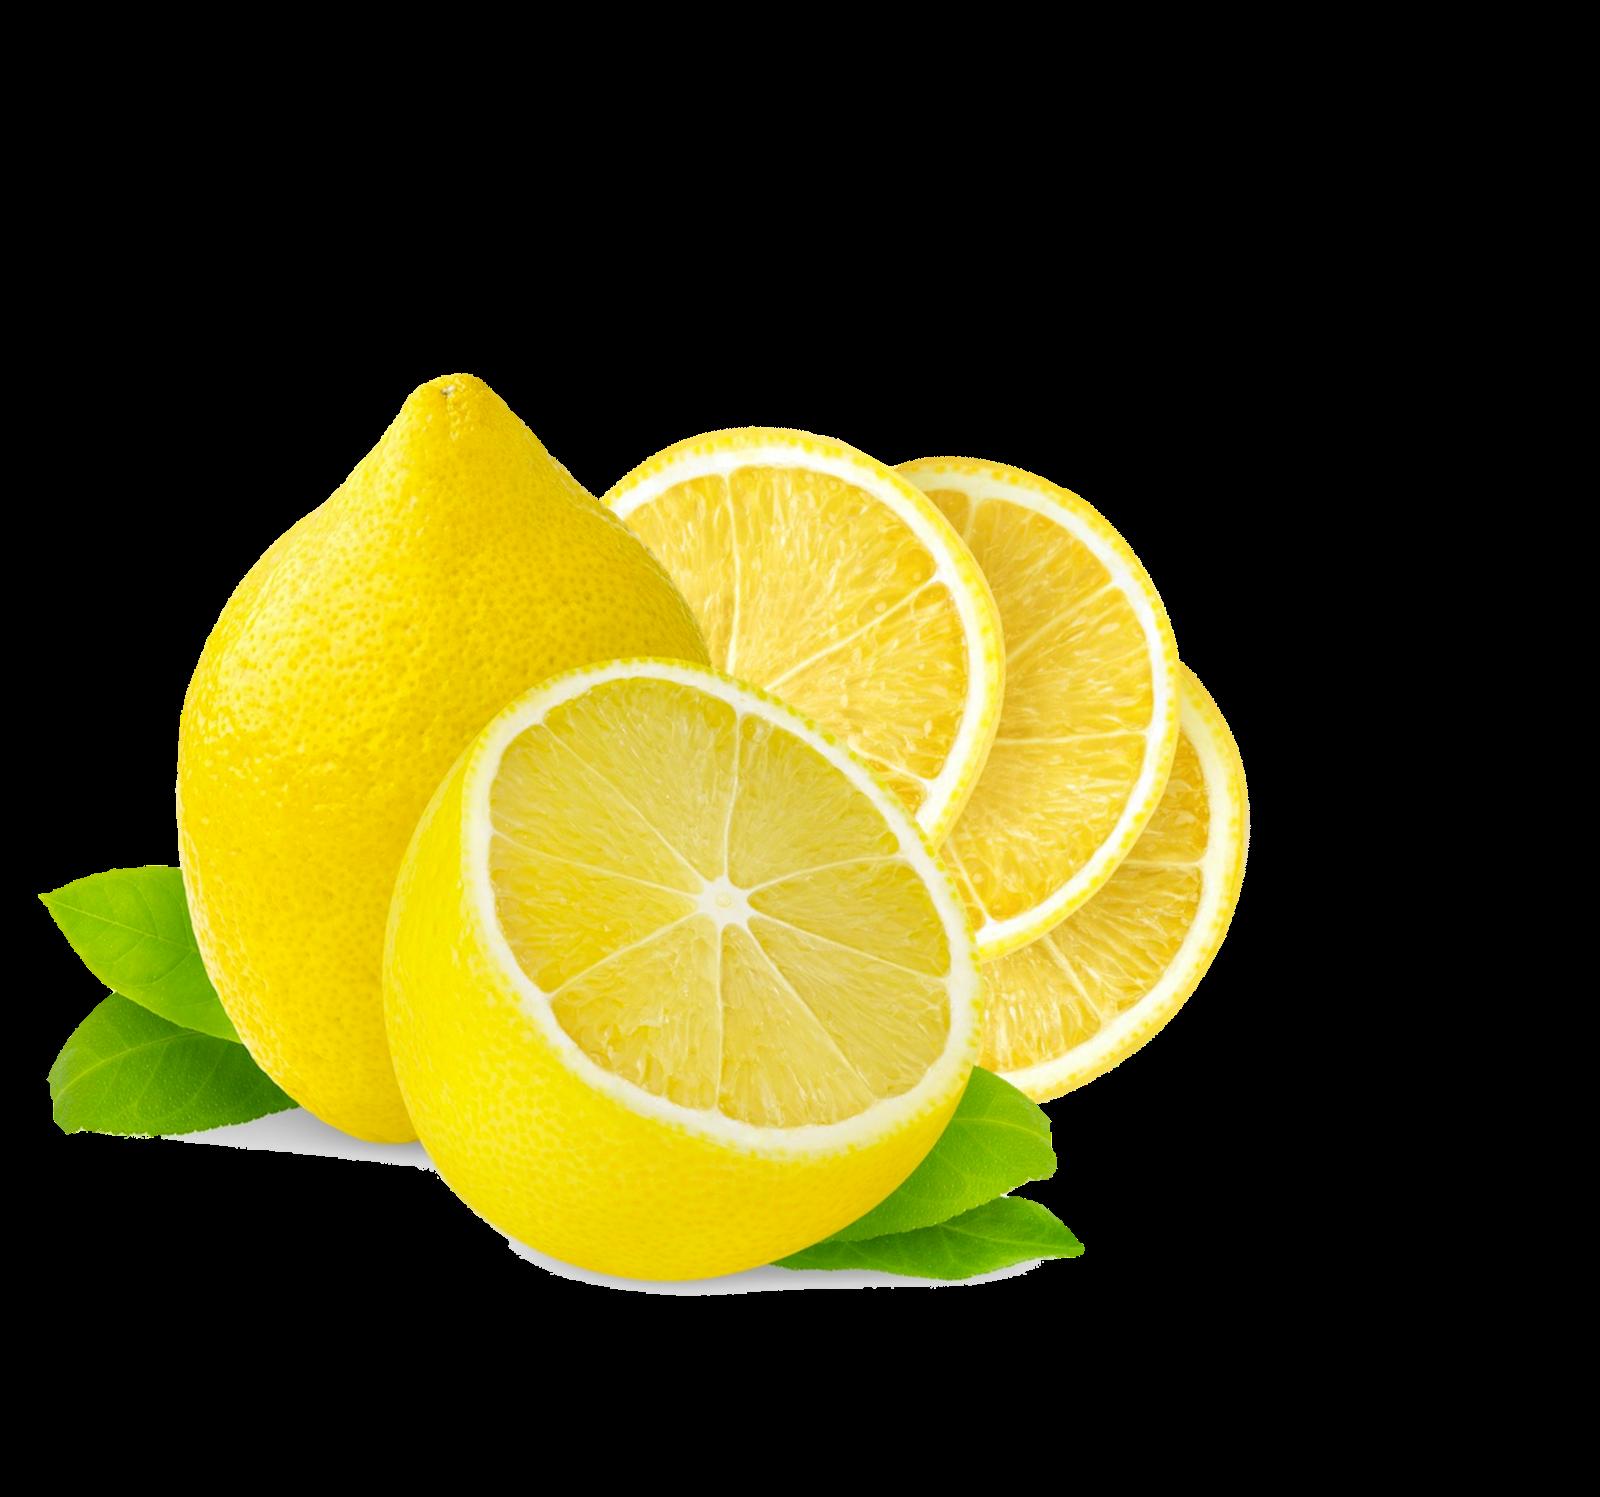 http://2.bp.blogspot.com/-s6rrXt4mPa8/Wt17q88DSpI/AAAAAAAASF4/jmJ0_aoNLC00nKcD2KHvthsX1NYmR2u5ACK4BGAYYCw/s1600/Lemons%2BClipart.png